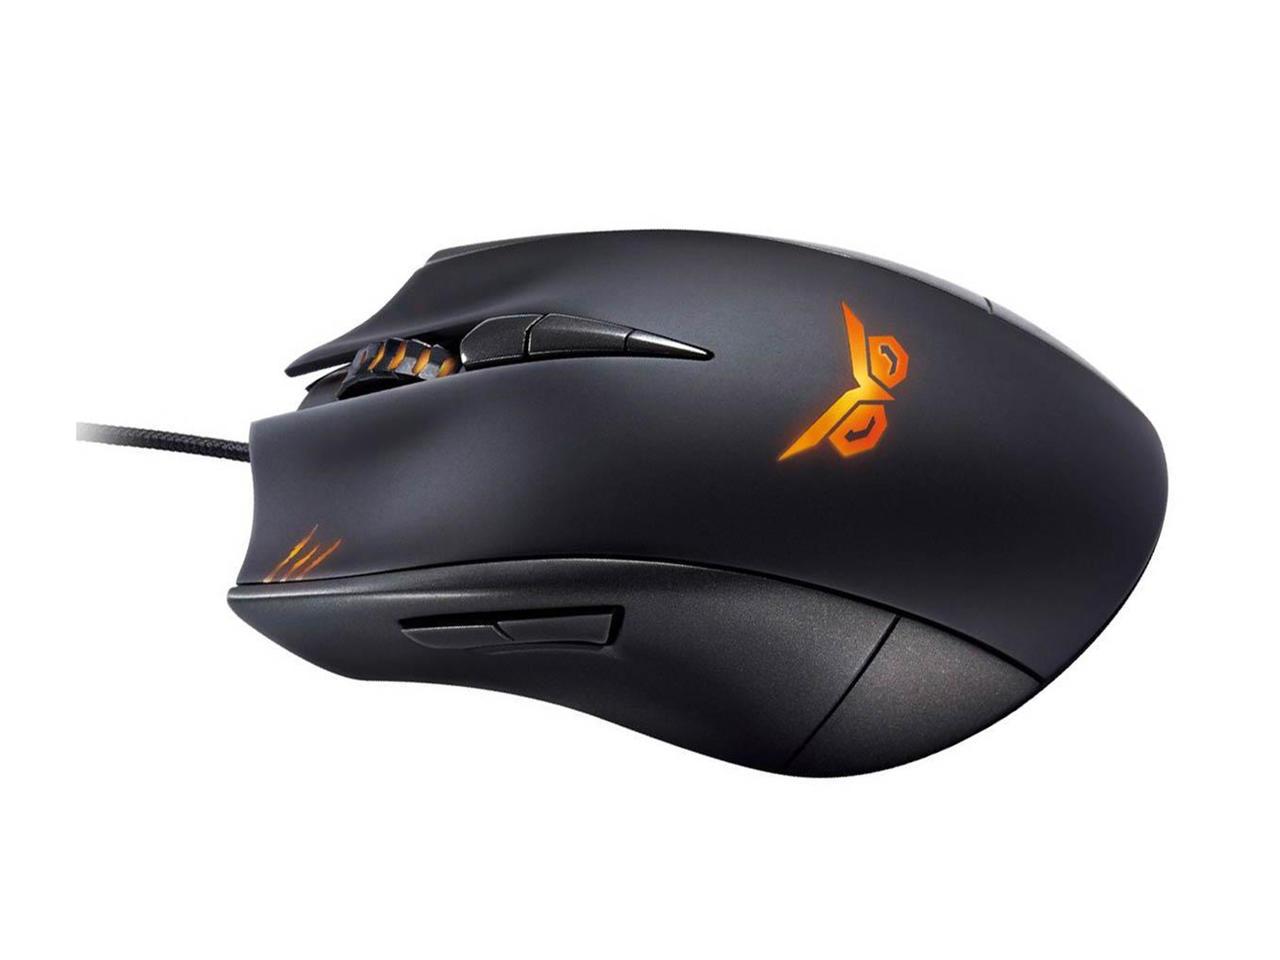 ASUS STRIX CLAW gaming mouse. dark   Laptop.bg - Технологията с теб